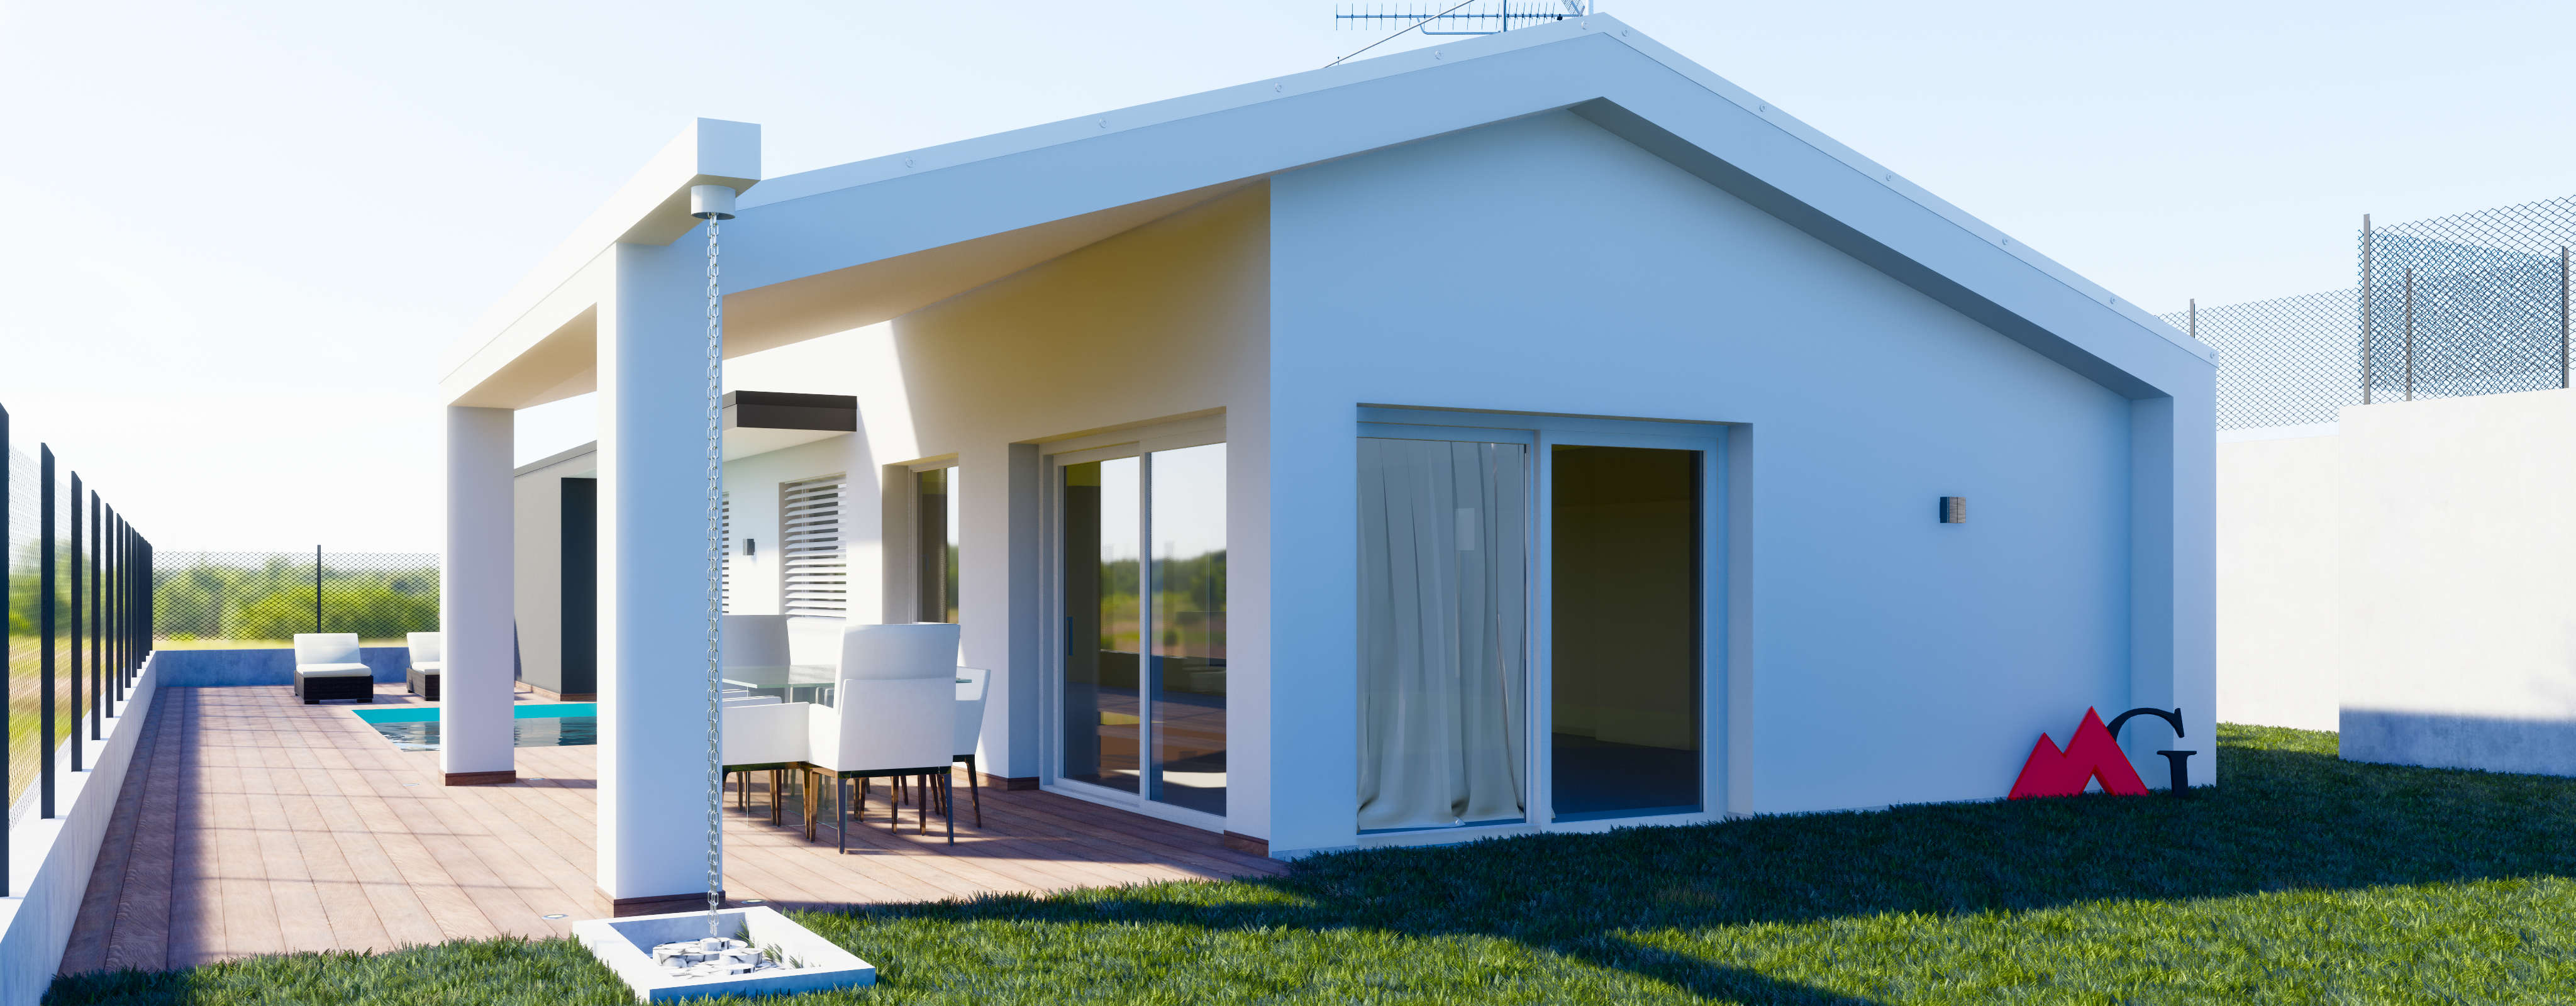 NZEB HOUSE 3